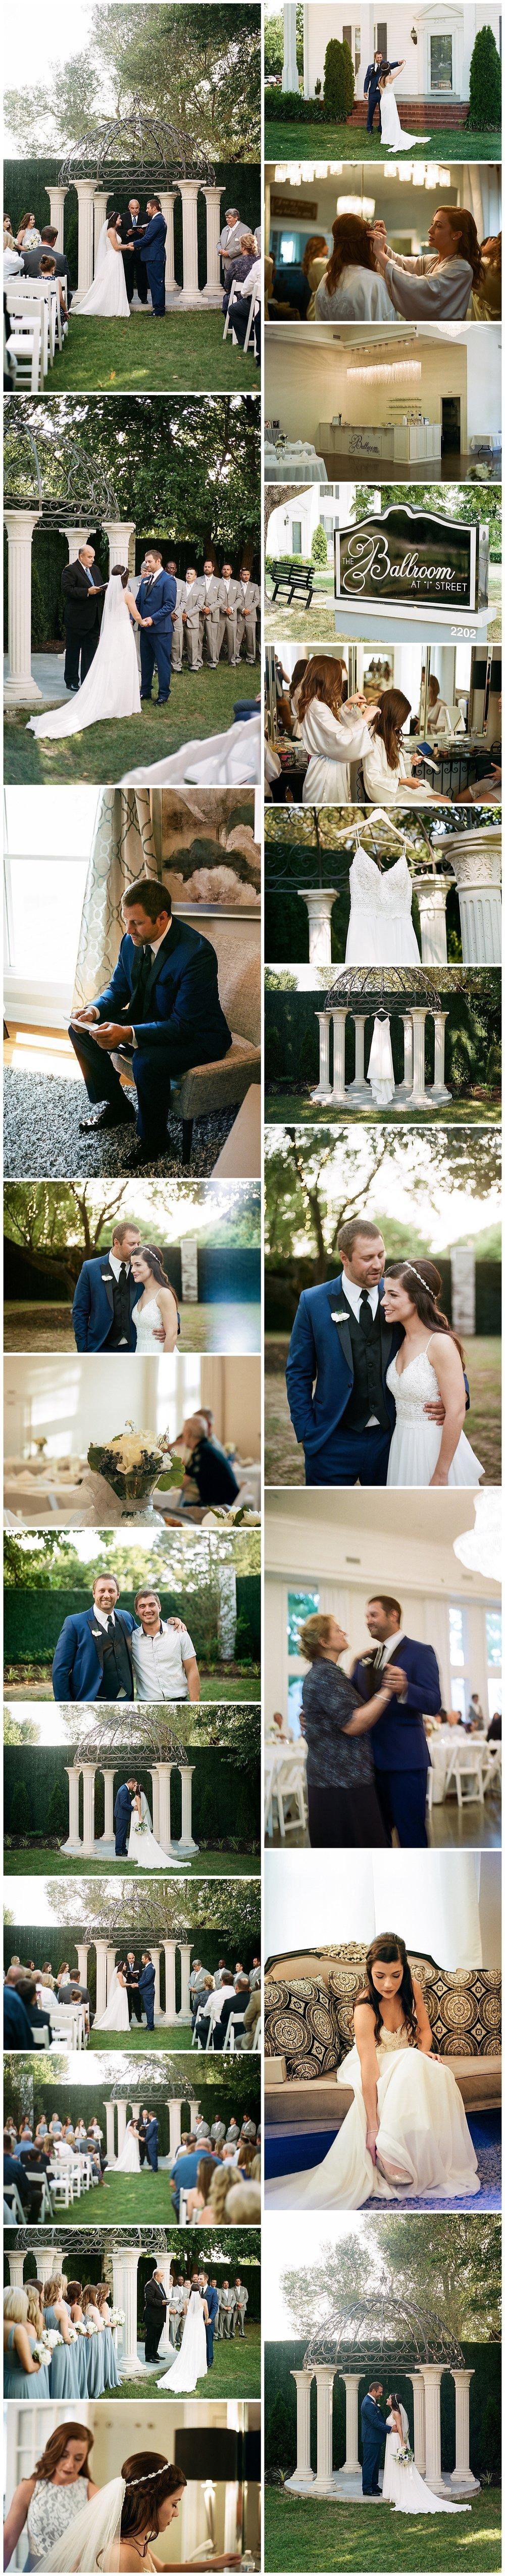 wedding film scans portraits 400 35mm